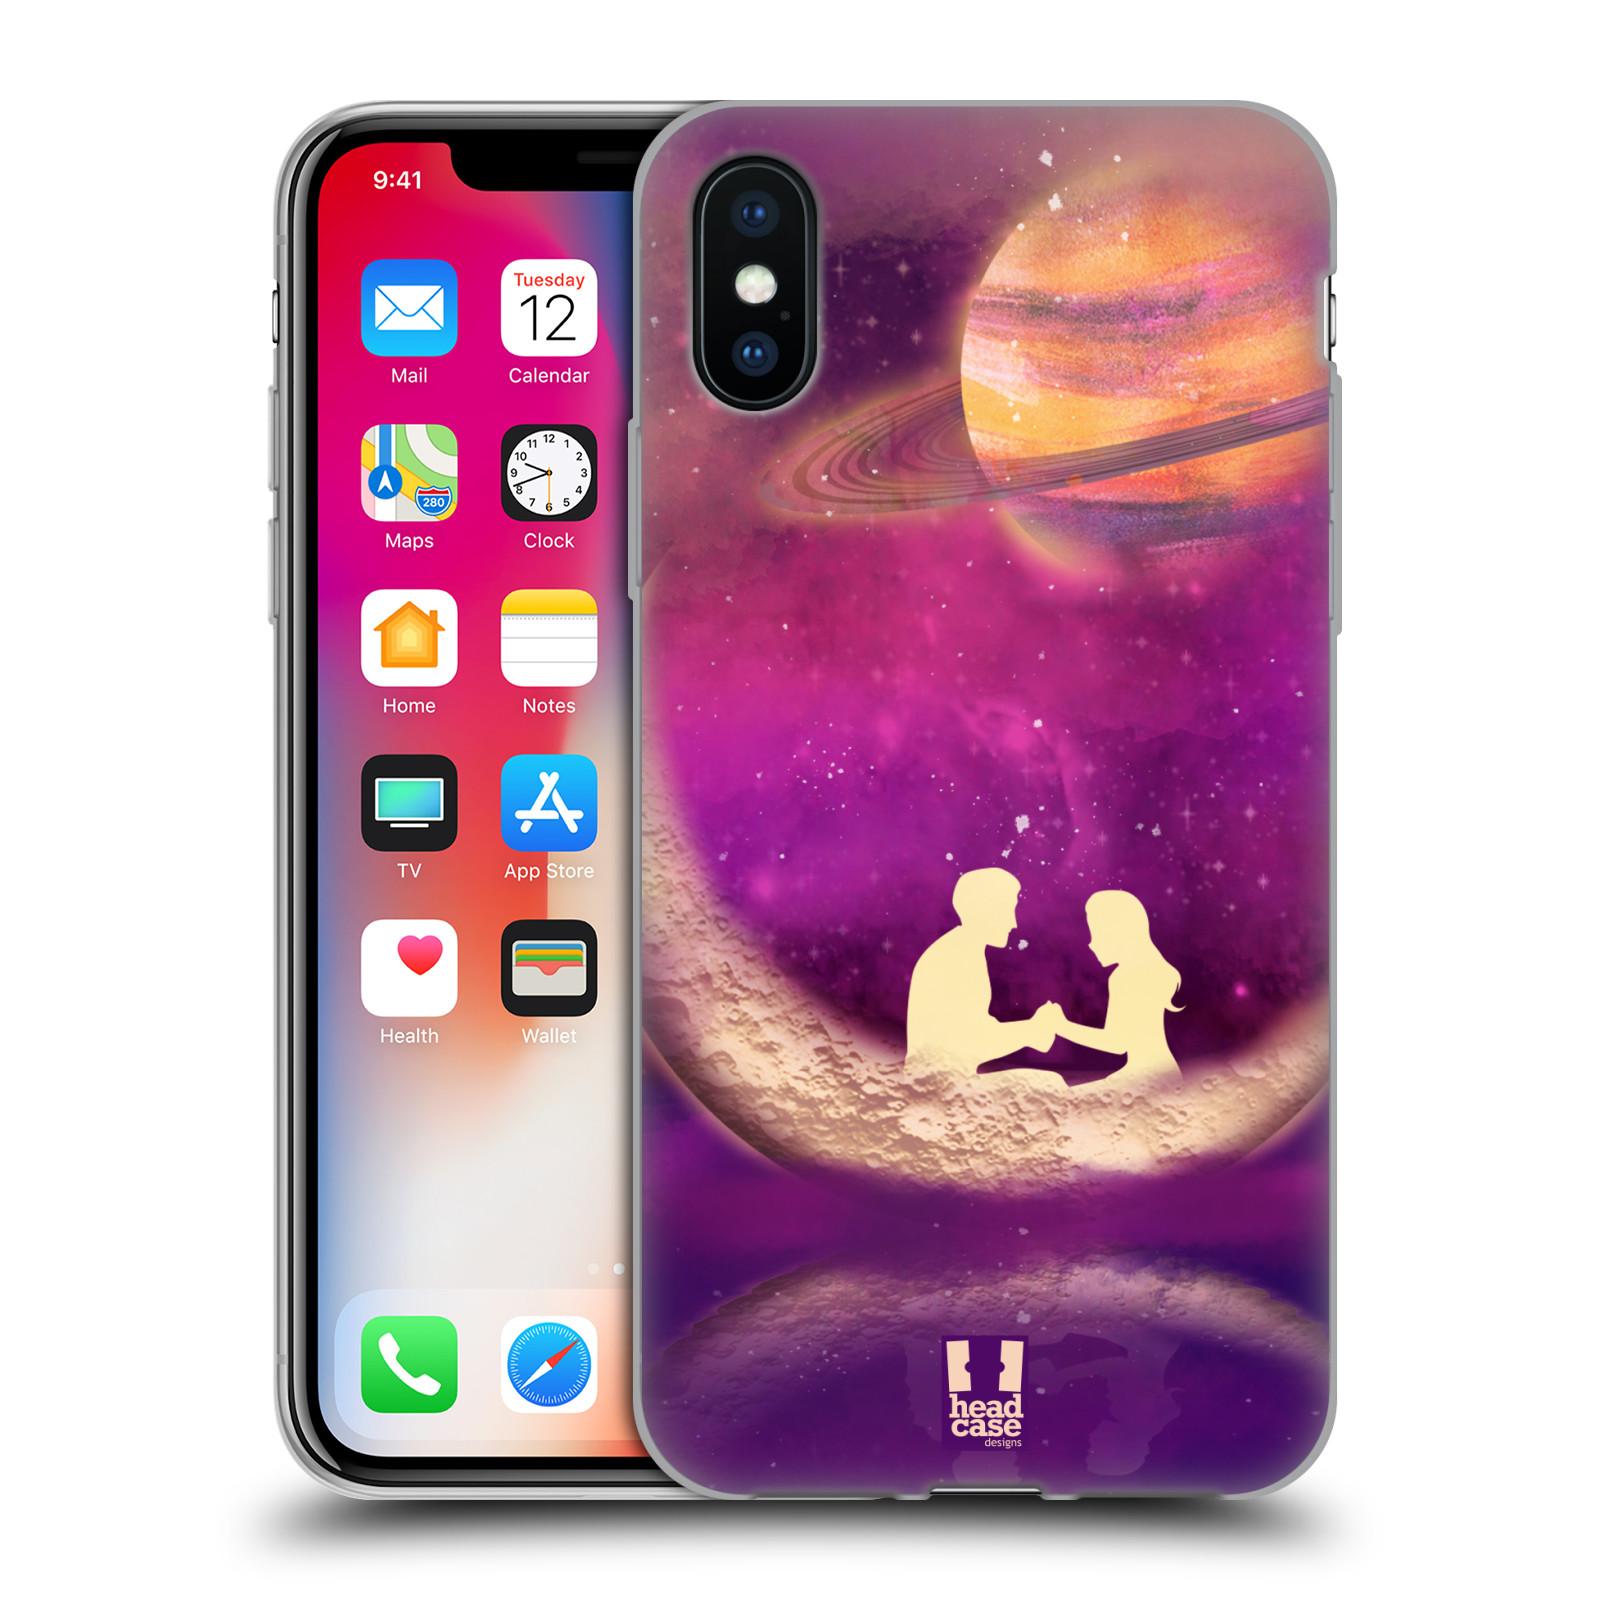 HEAD-CASE-DESIGNS-MOON-TRAVEL-SOFT-GEL-CASE-FOR-APPLE-iPHONE-PHONES